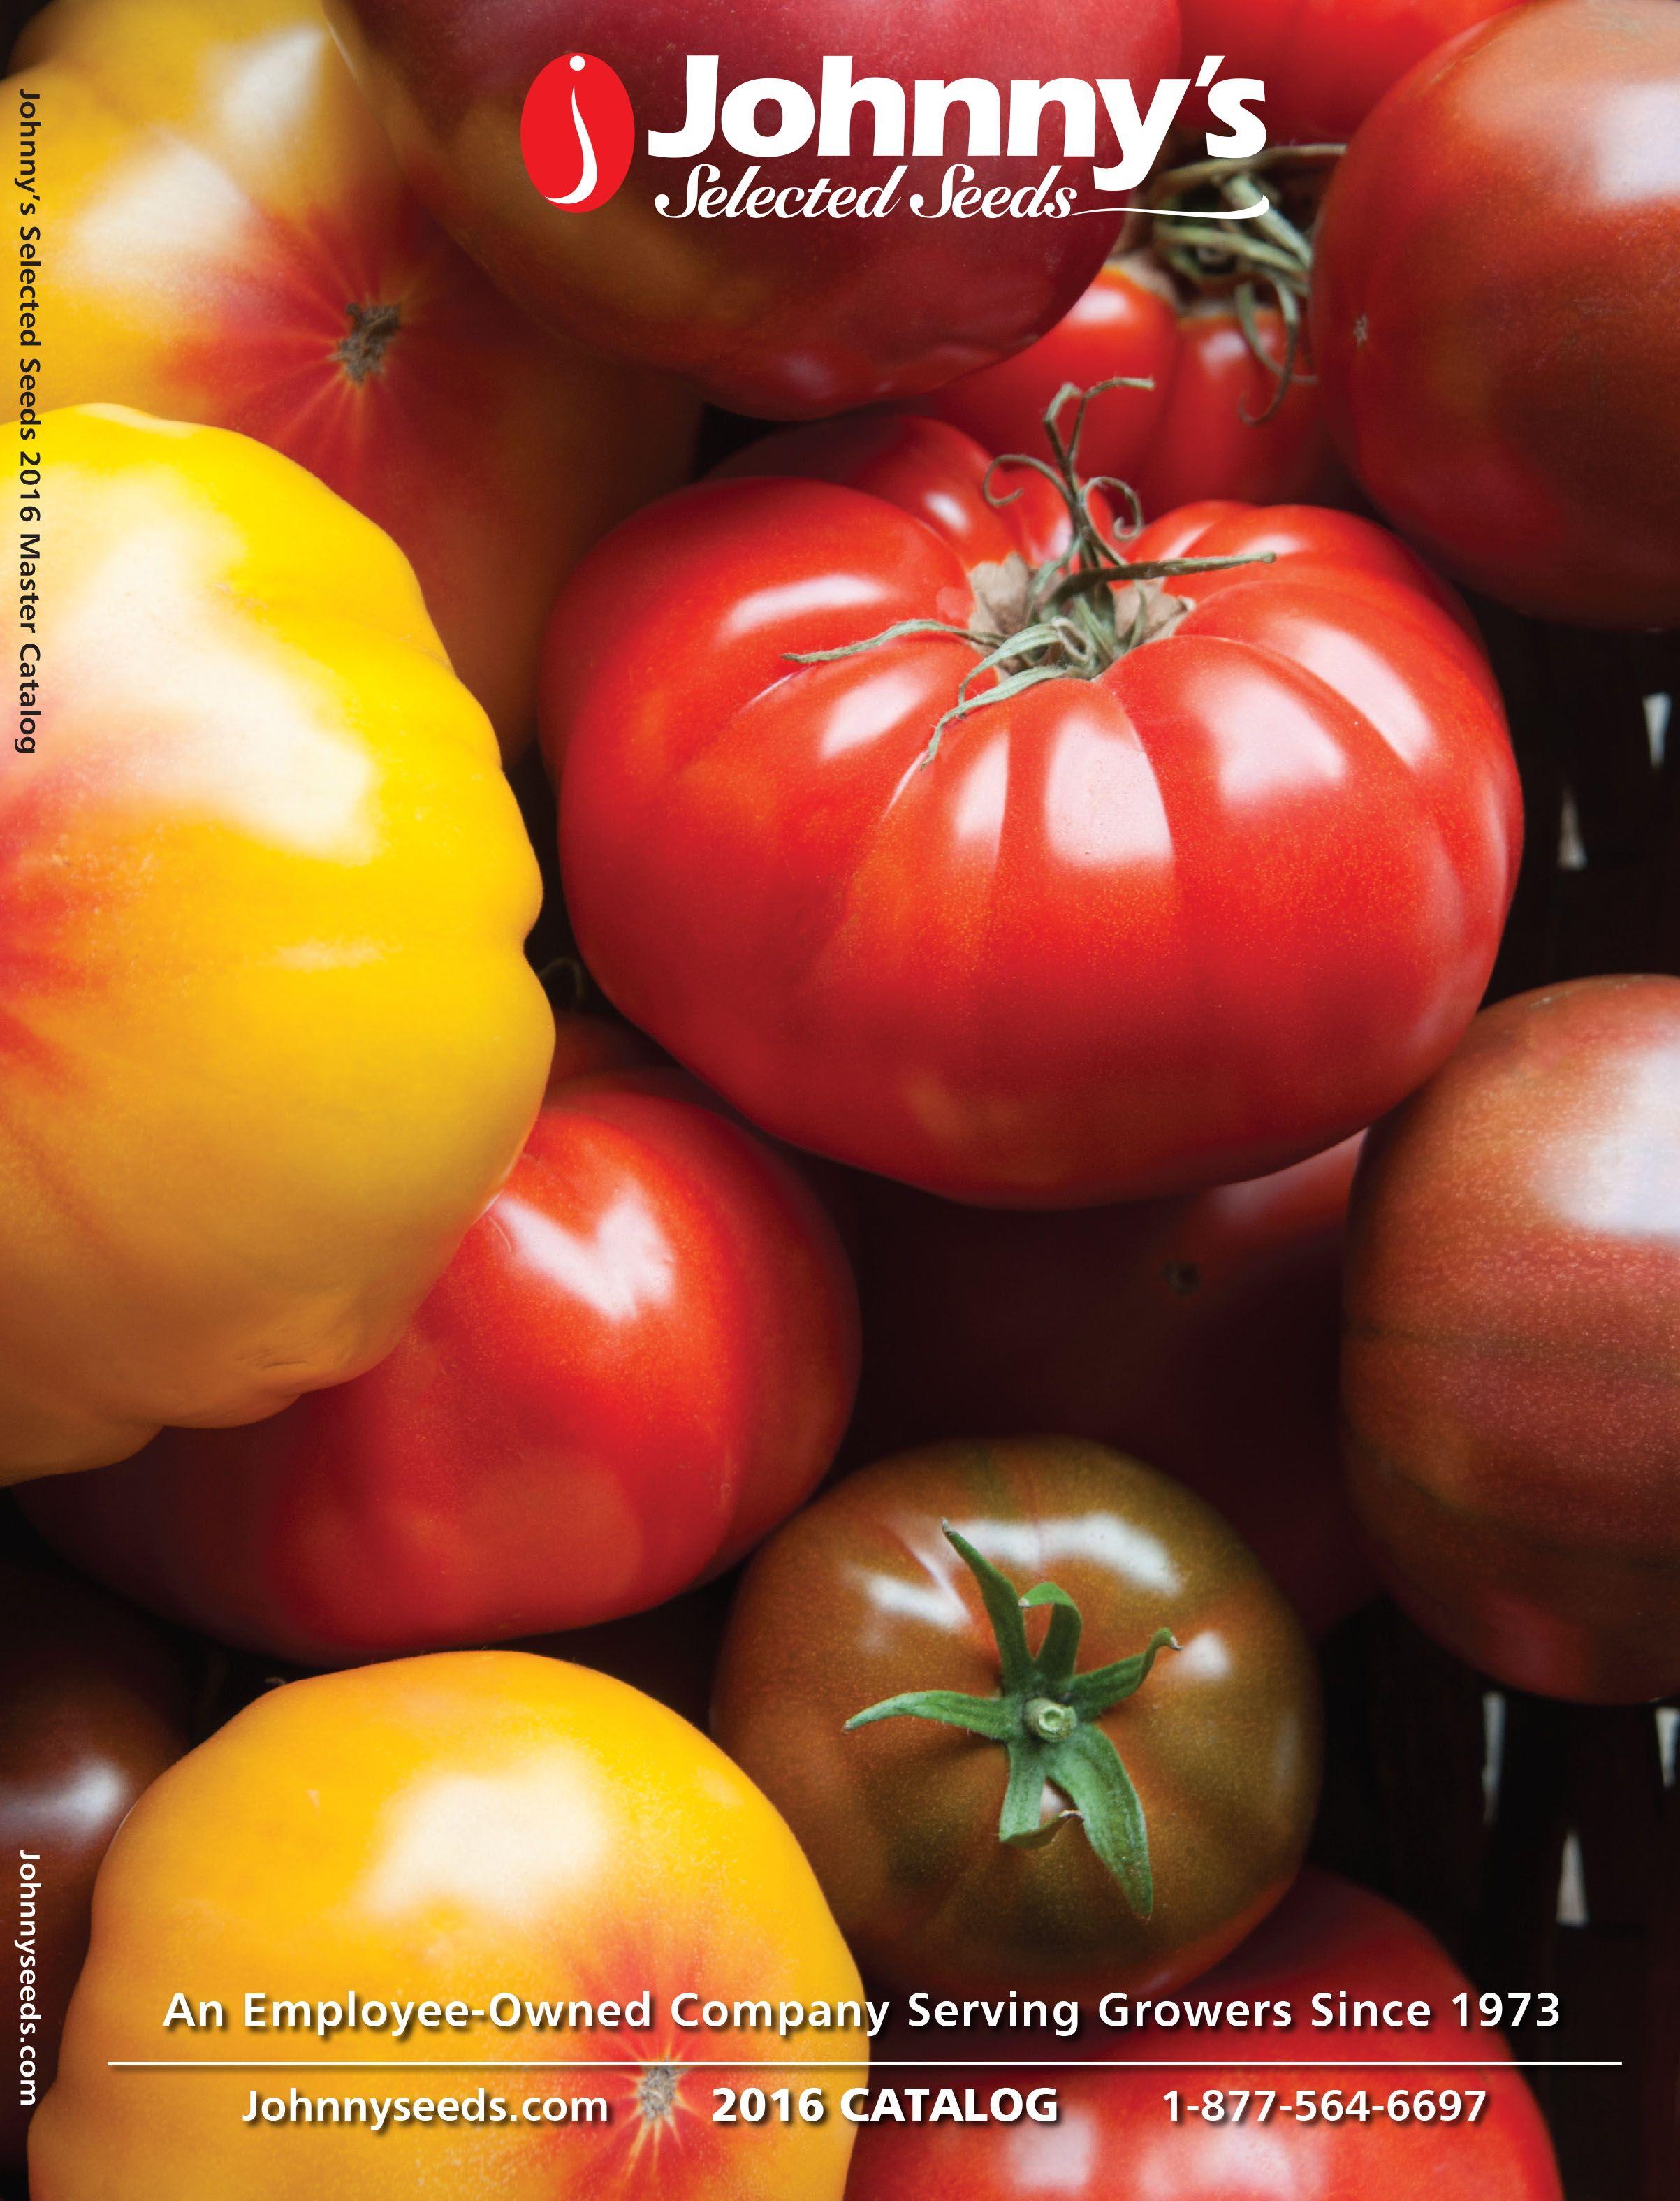 Johnnys selected seeds 2016 organic seeds heirloom seeds